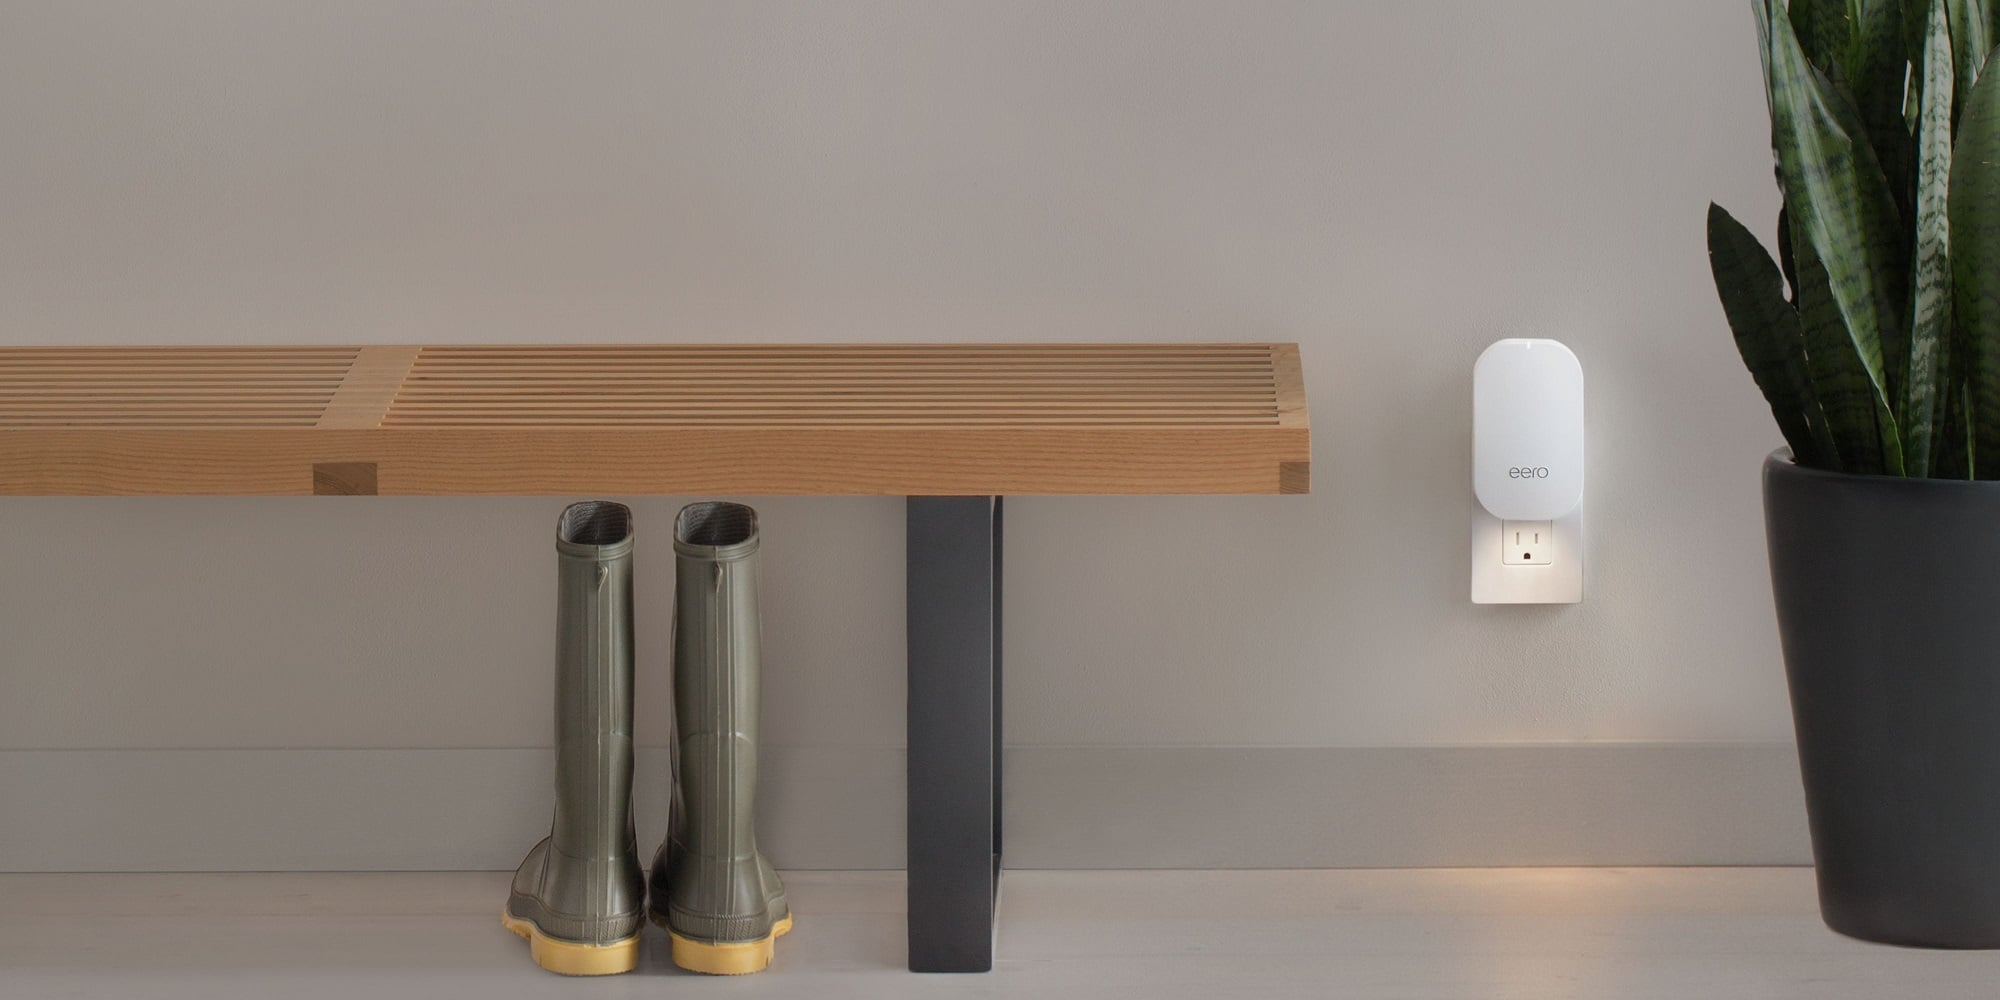 Eero Unveils 2nd Gen Eero Mesh Wi Fi System Eero Beacon Eero